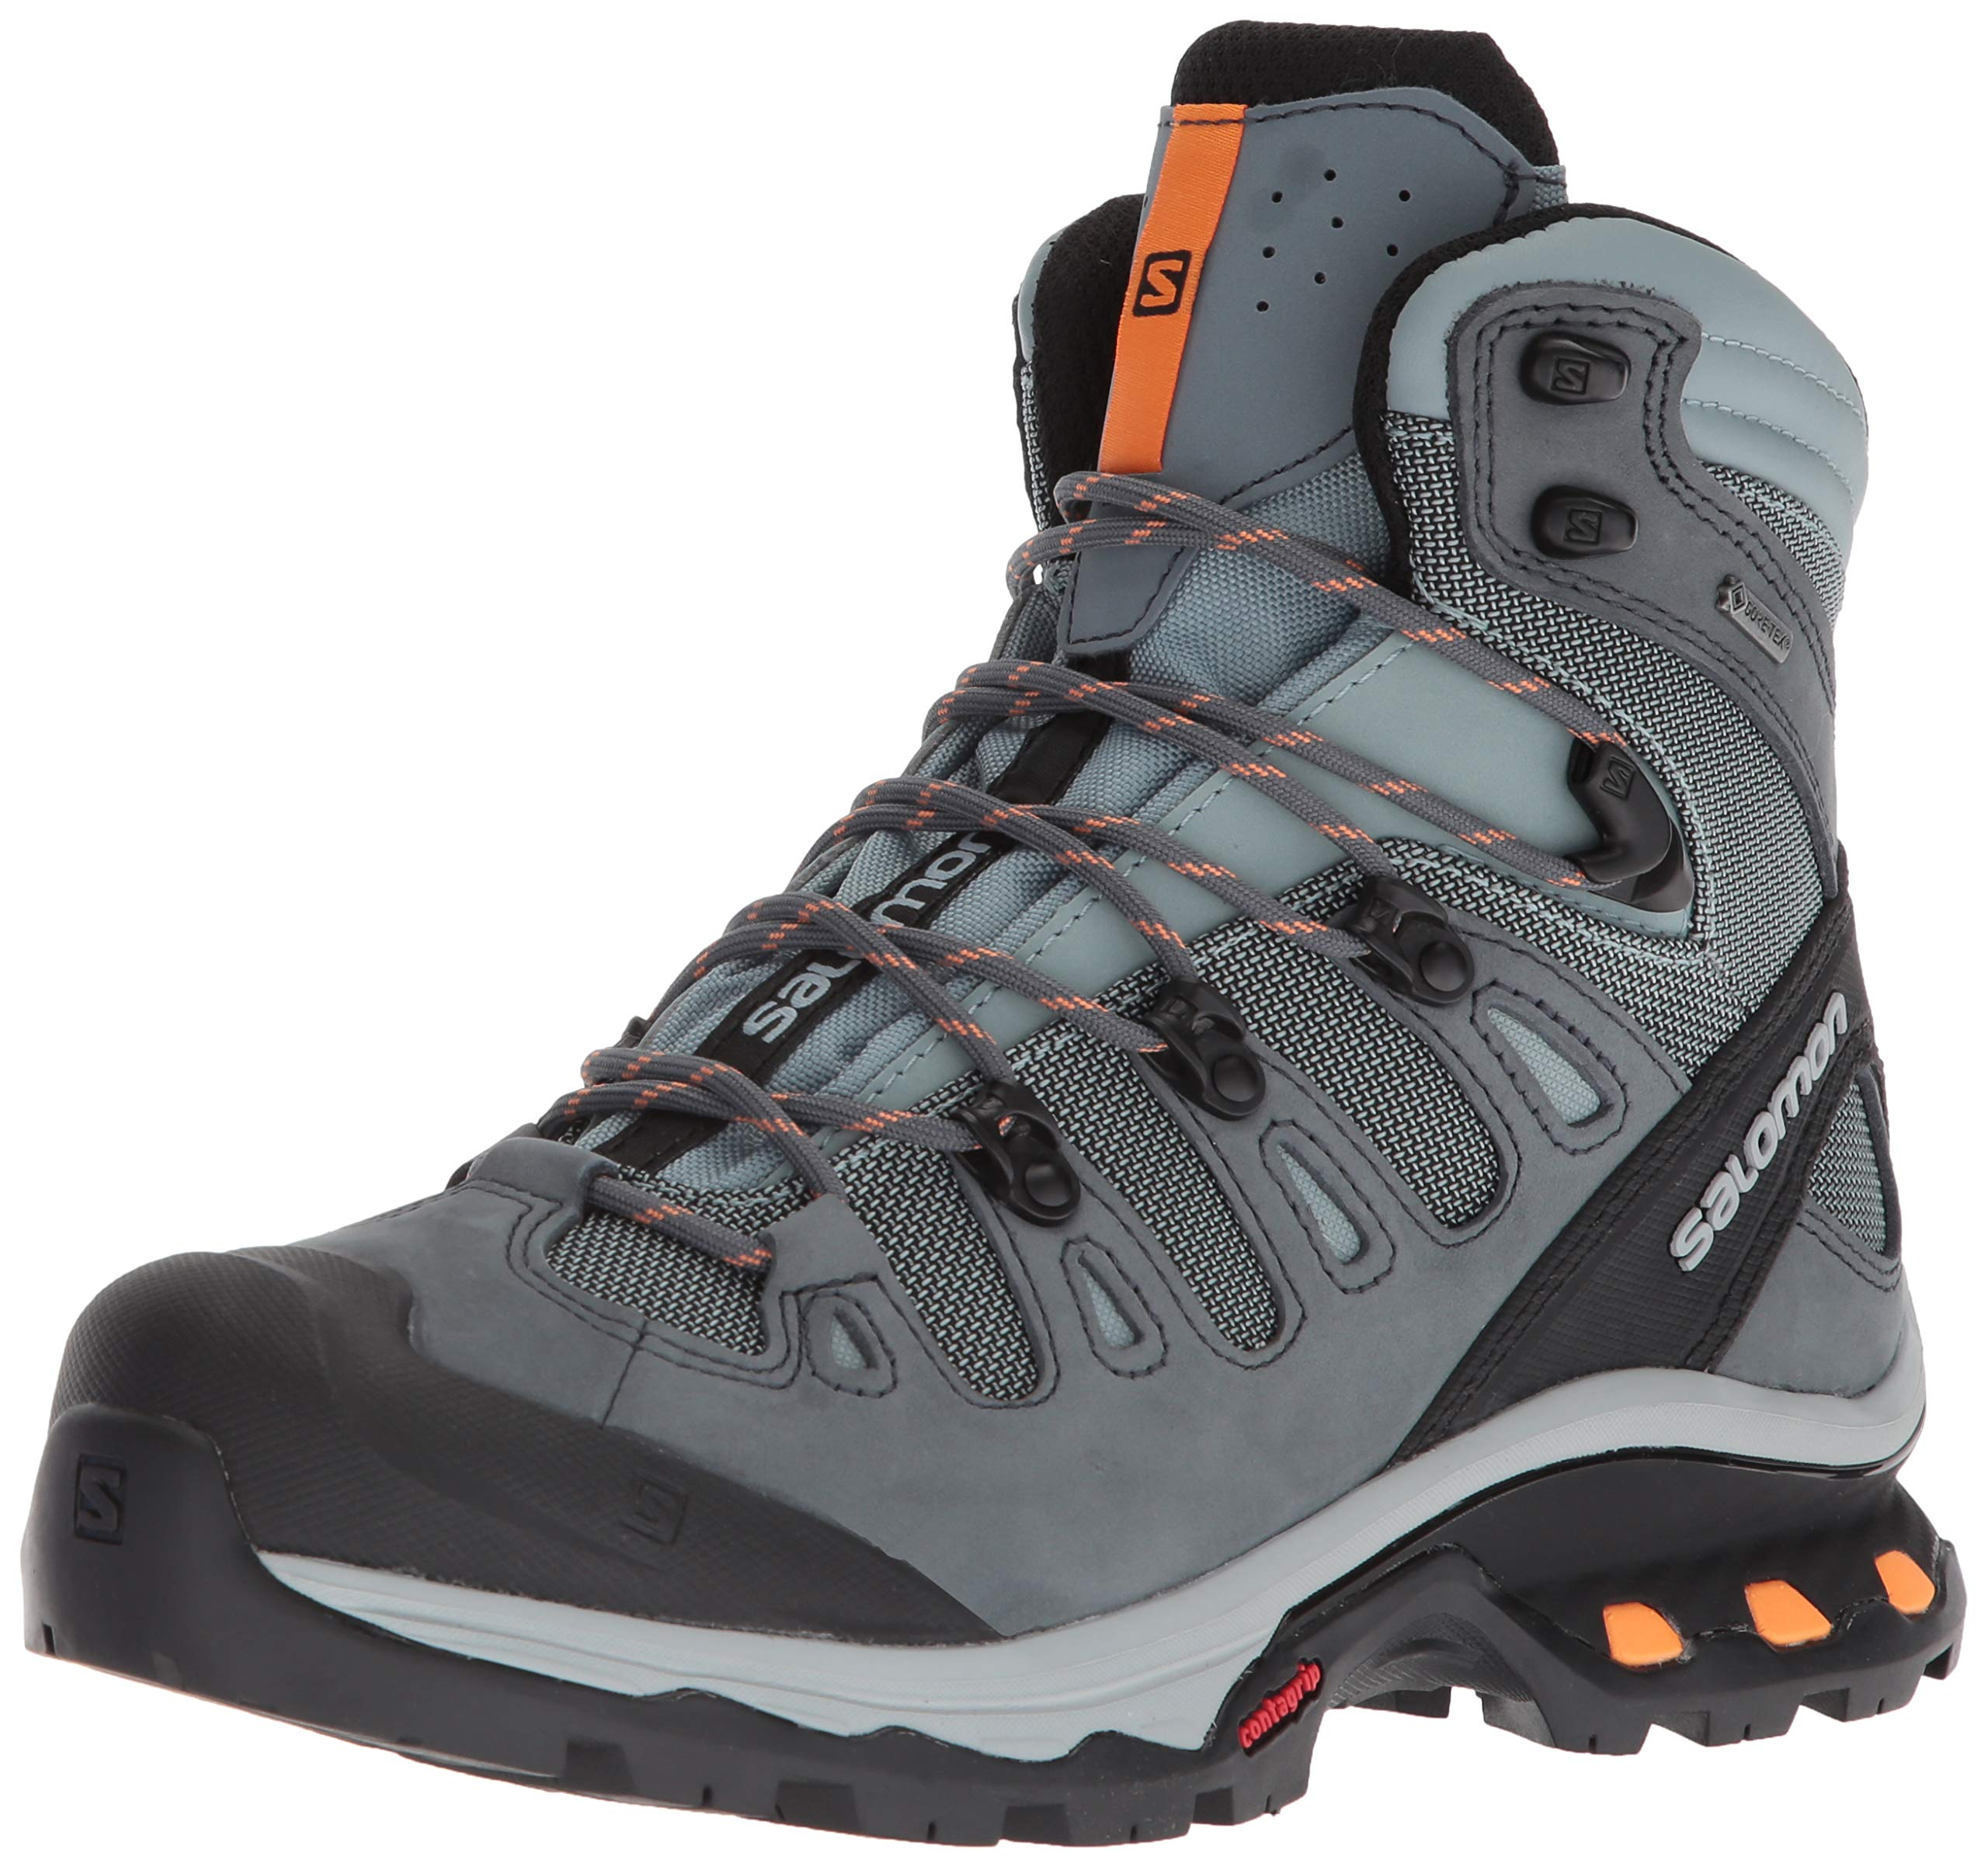 SALOMON Women's Quest 4d 3 GTX W High Rise Hiking Boots 1